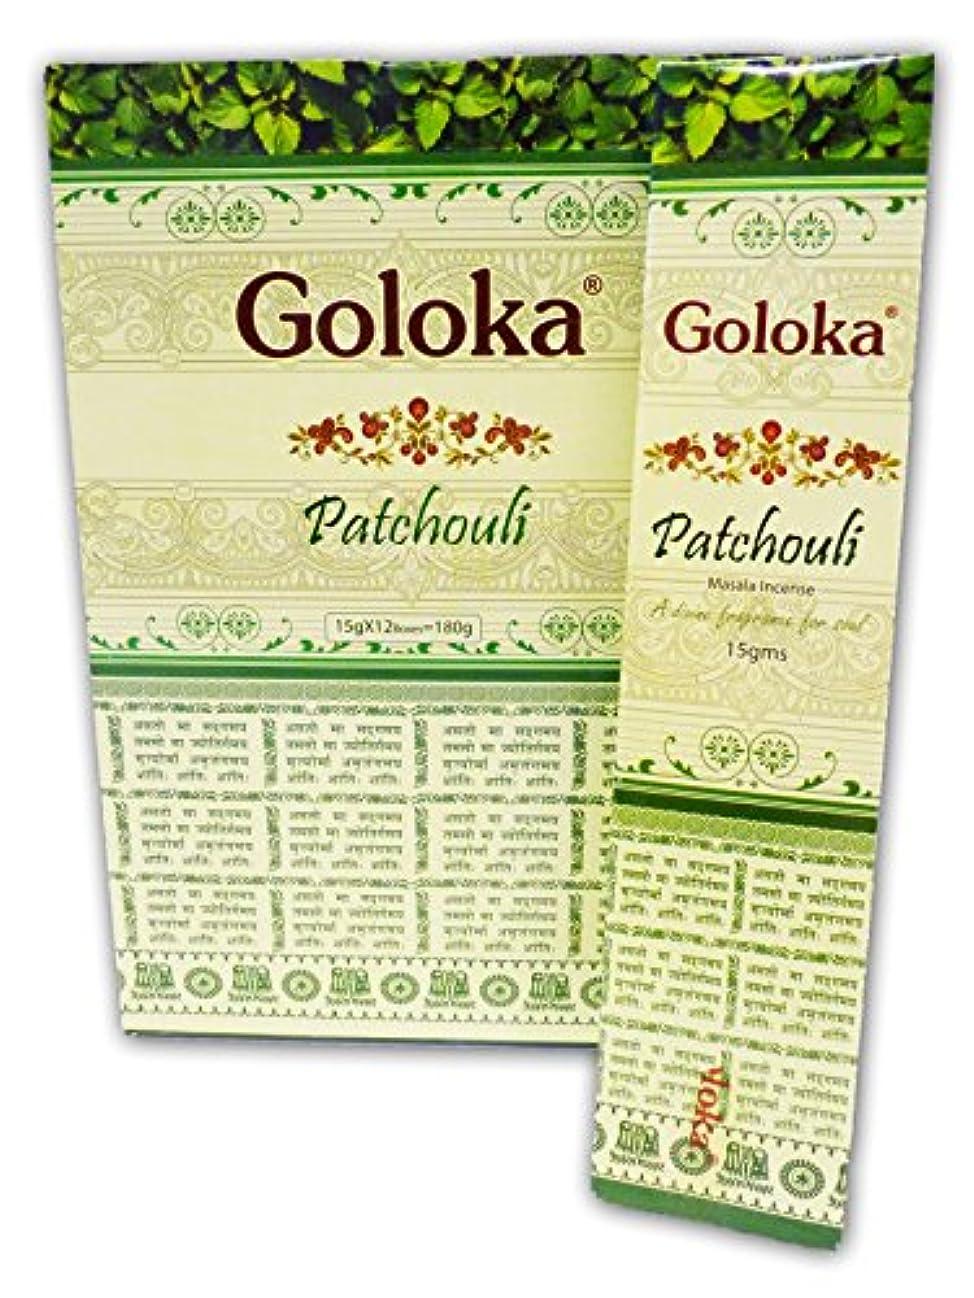 堀権威団結Goloka Patchouli Incense, 15 Gms x 12 Packs